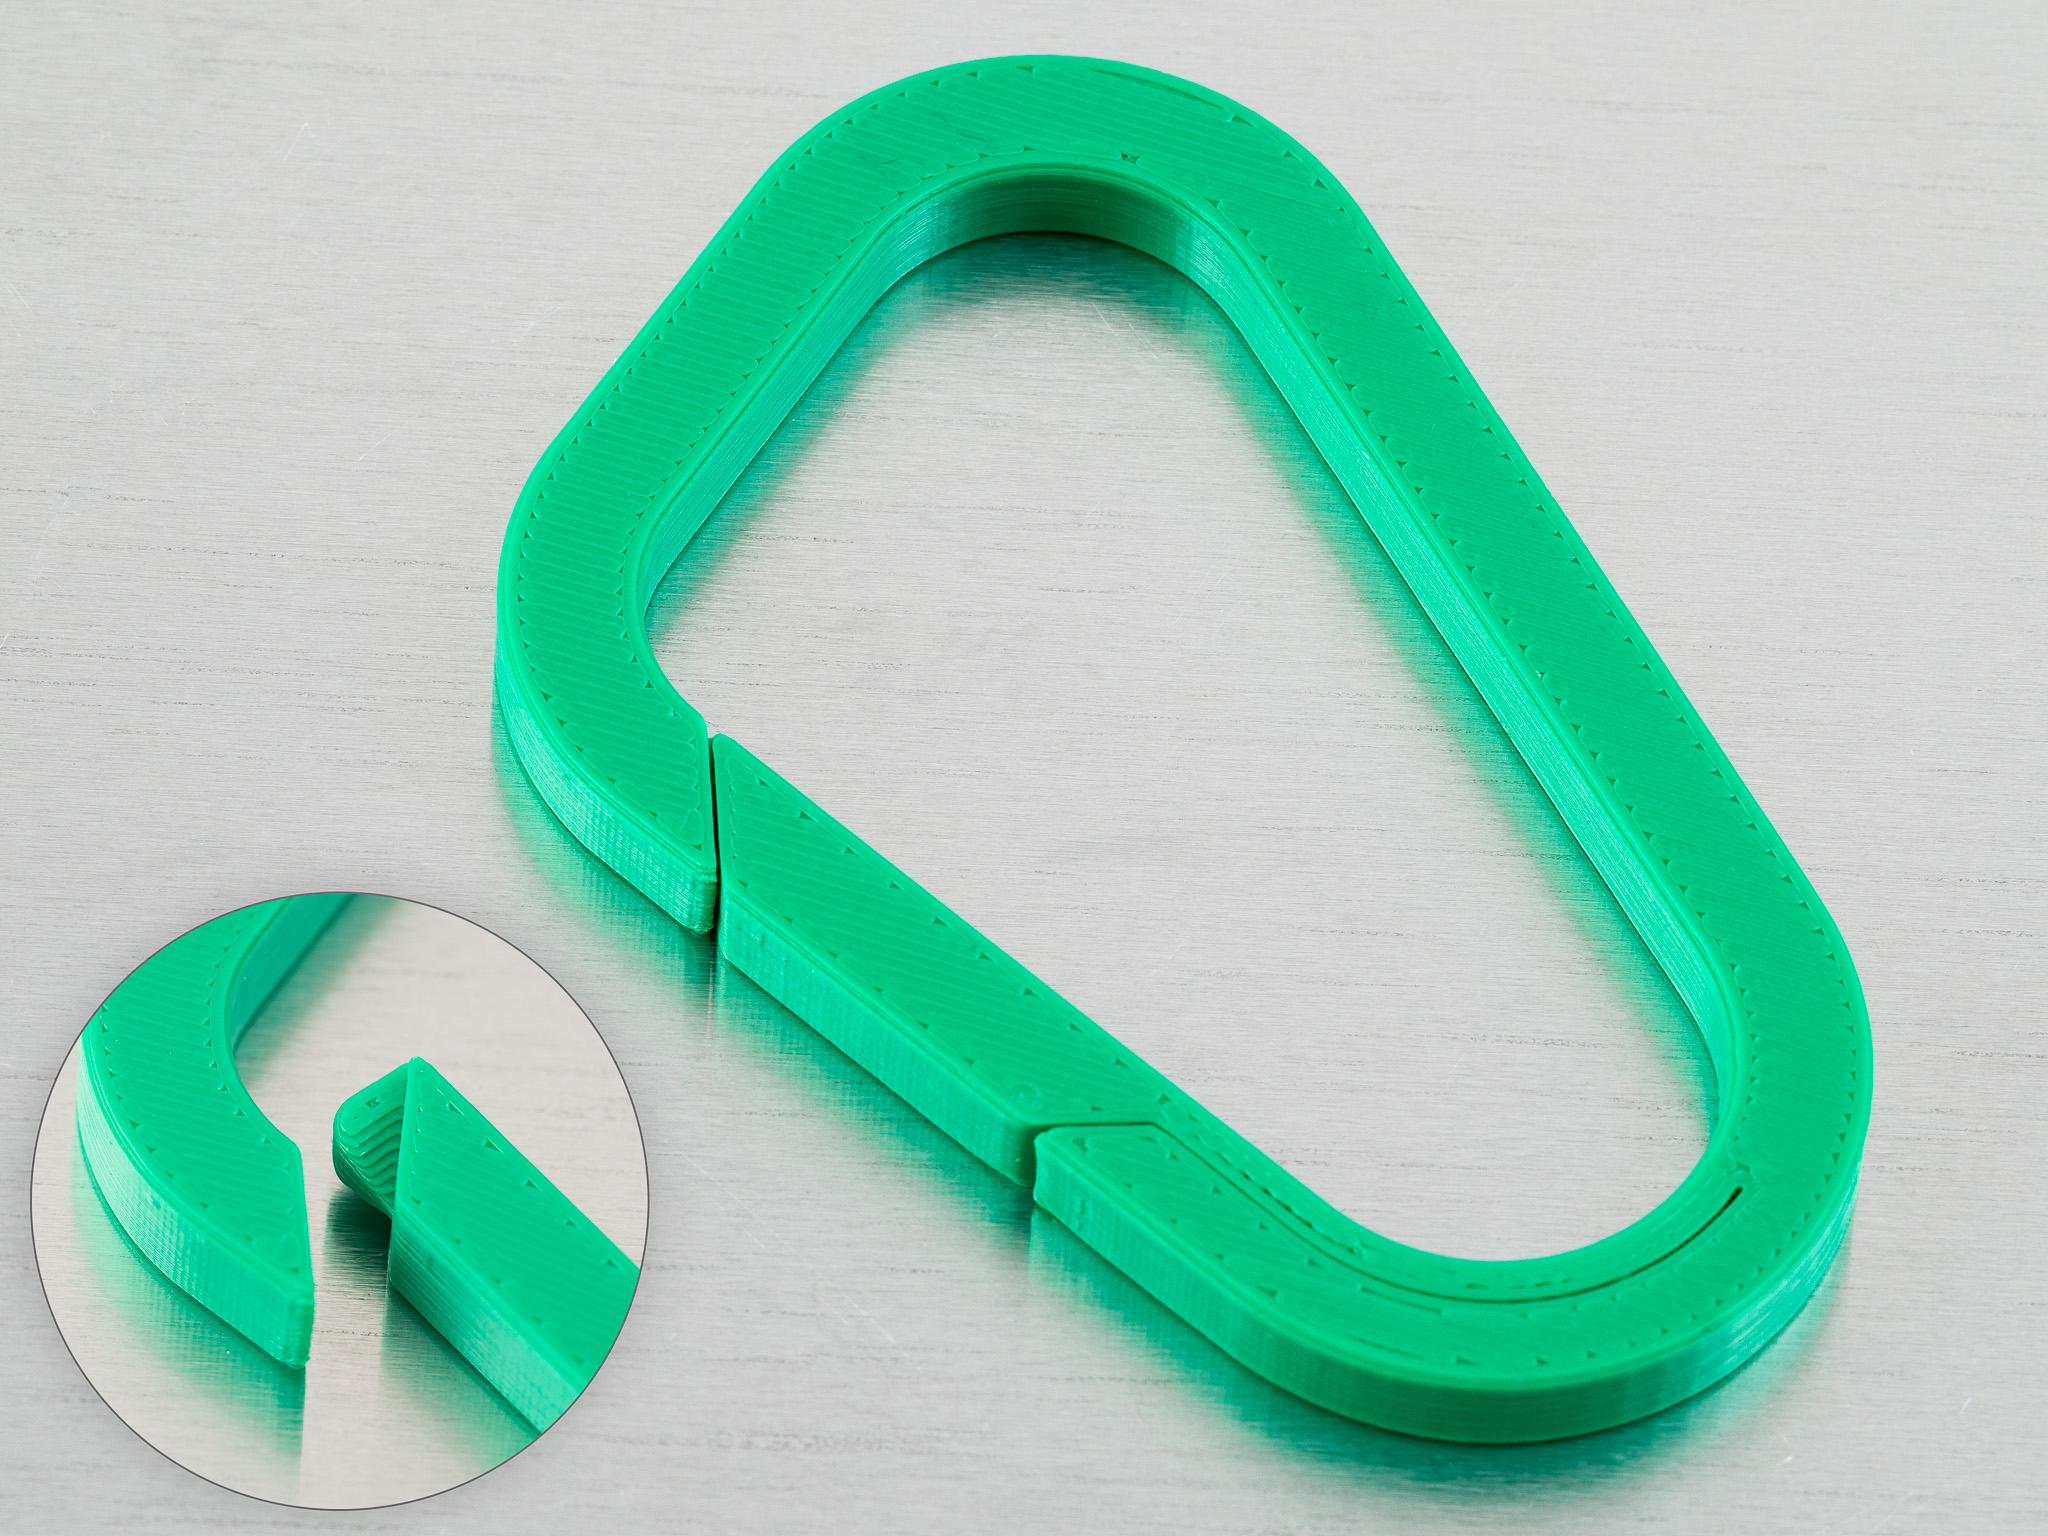 IMGP1974-Edit.jpg Download free STL file Asymmetric Carabiner • Design to 3D print, WalterHsiao